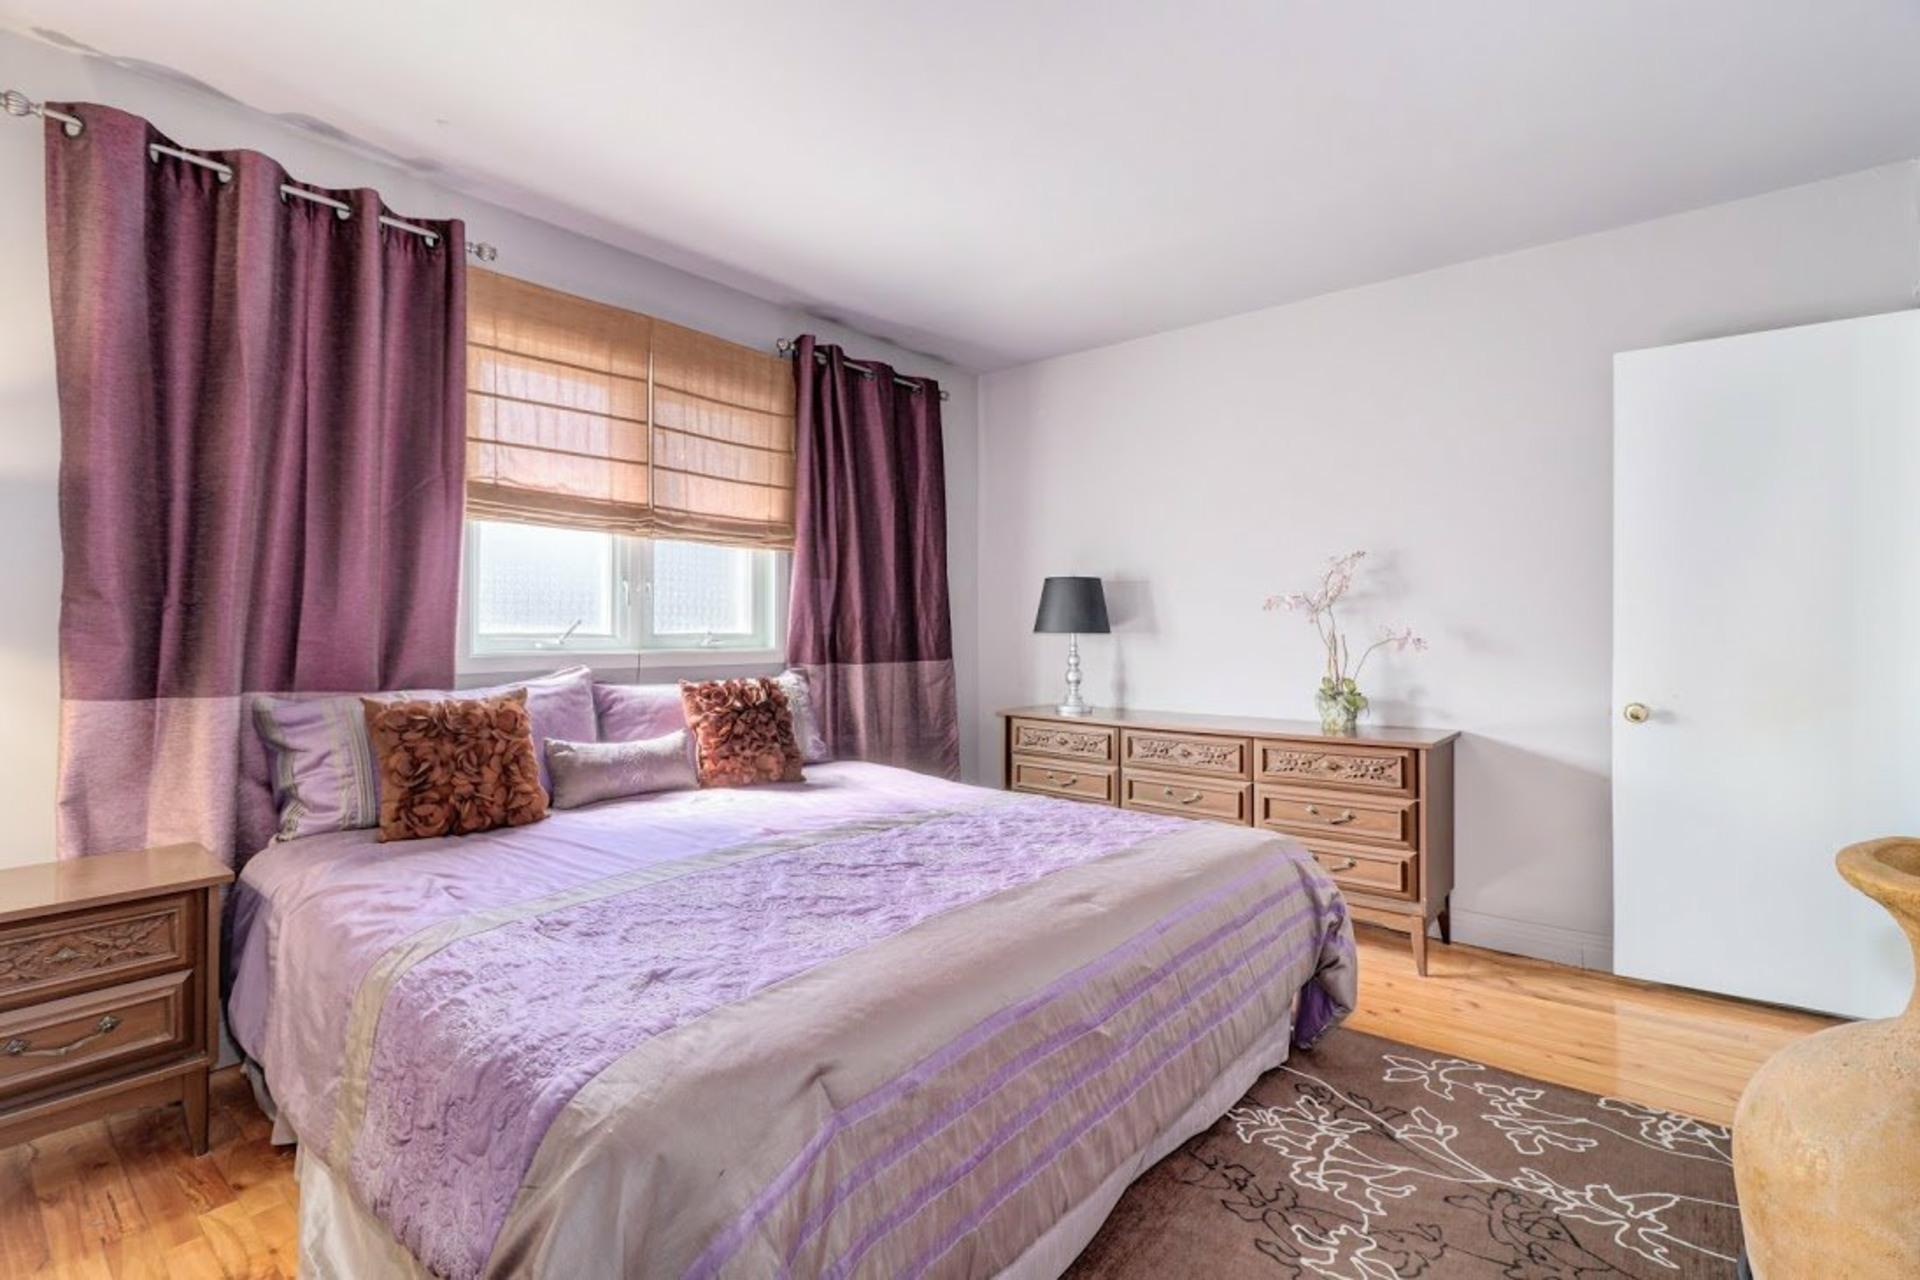 image 13 - House For sale Notre-Dame-des-Prairies - 9 rooms